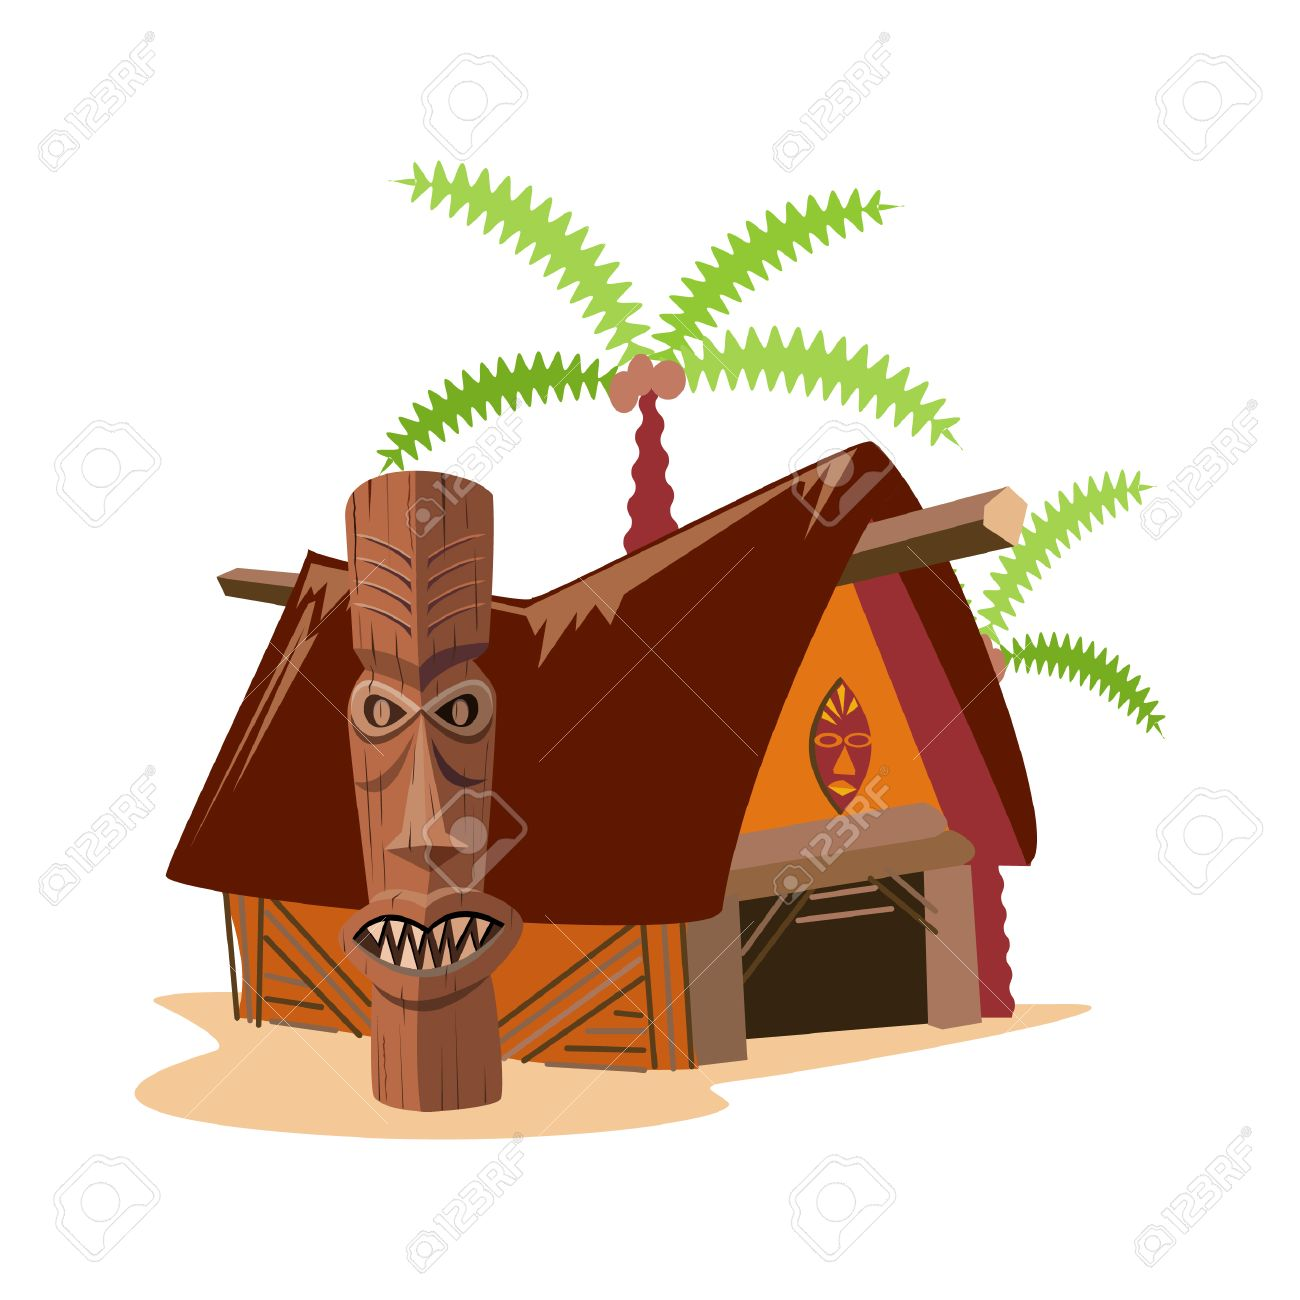 97 tiki hut stock vector illustration and royalty free tiki hut clipart rh 123rf com Tiki Hut Vector Clip Art Tiki Hut Clip Art Black and White